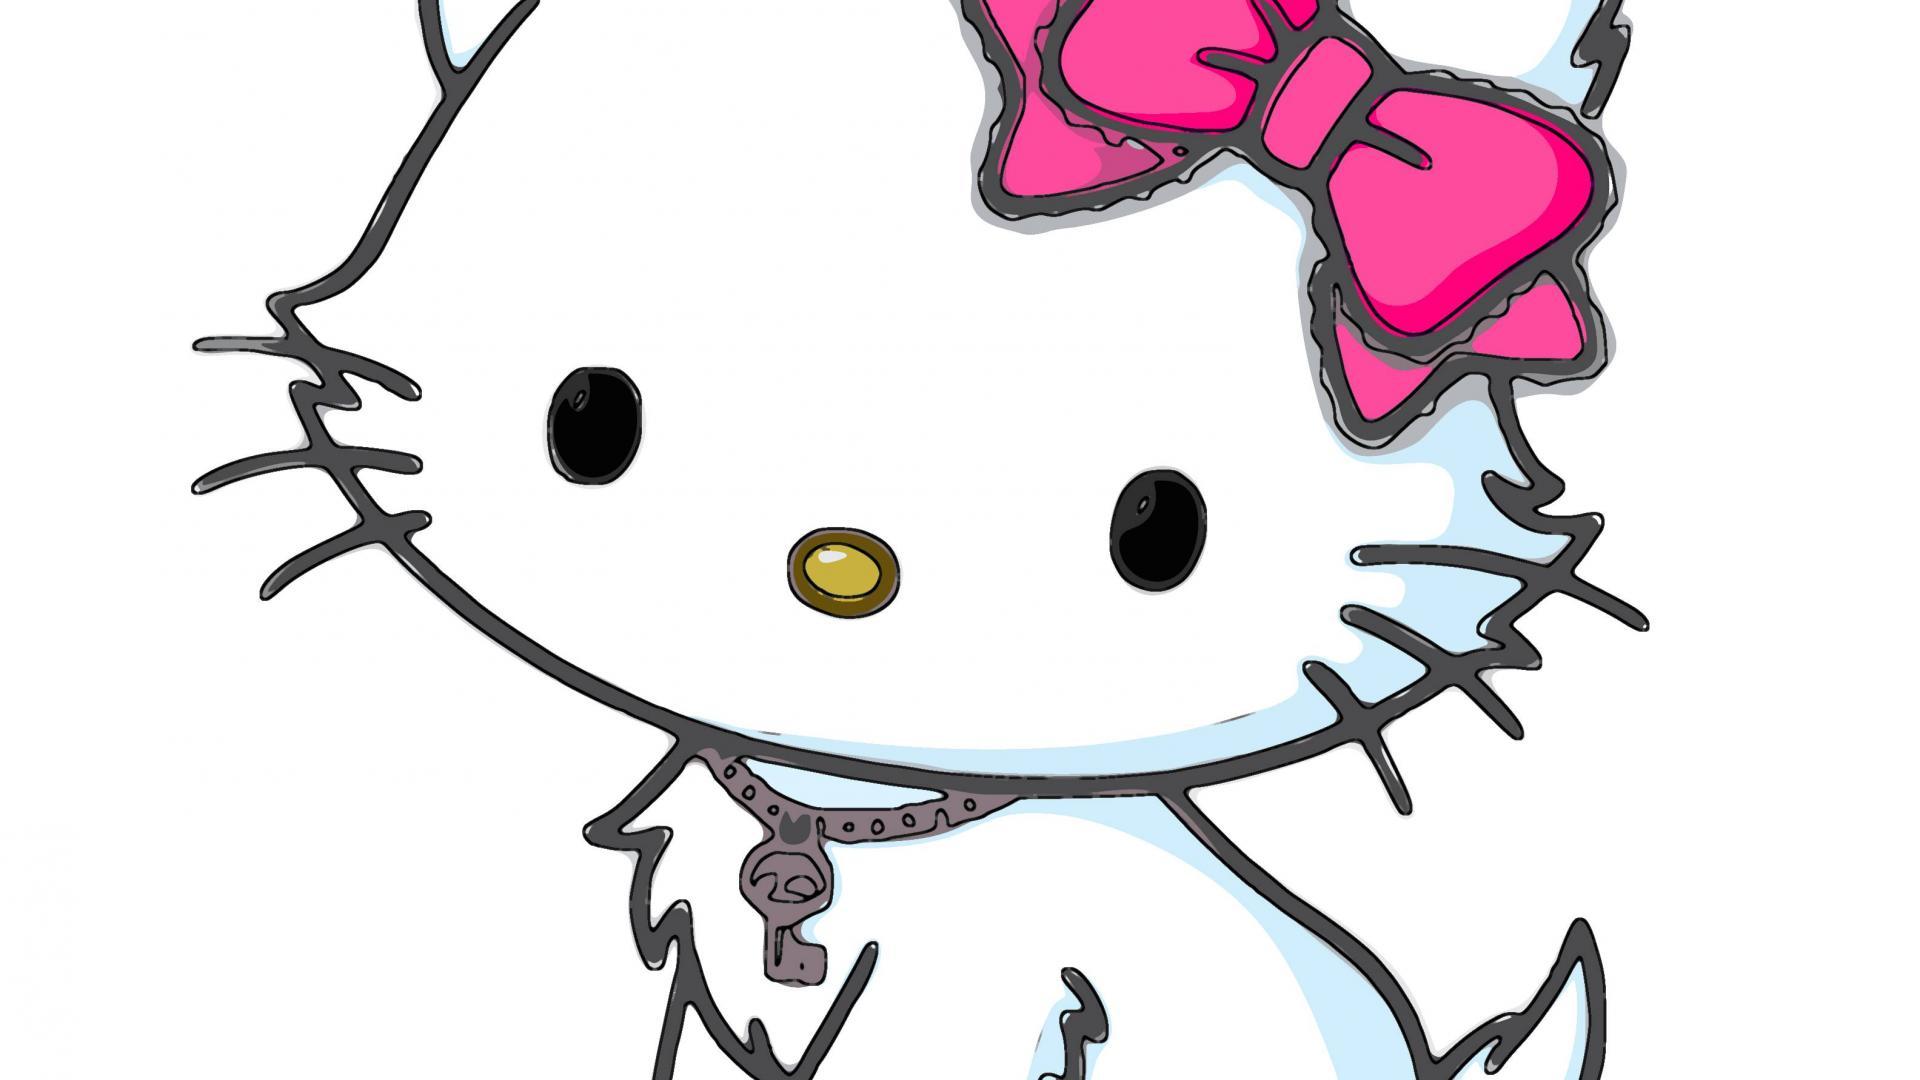 Download Wallpaper High Resolution Hello Kitty - 6YoGZ4  Snapshot_152118.jpg